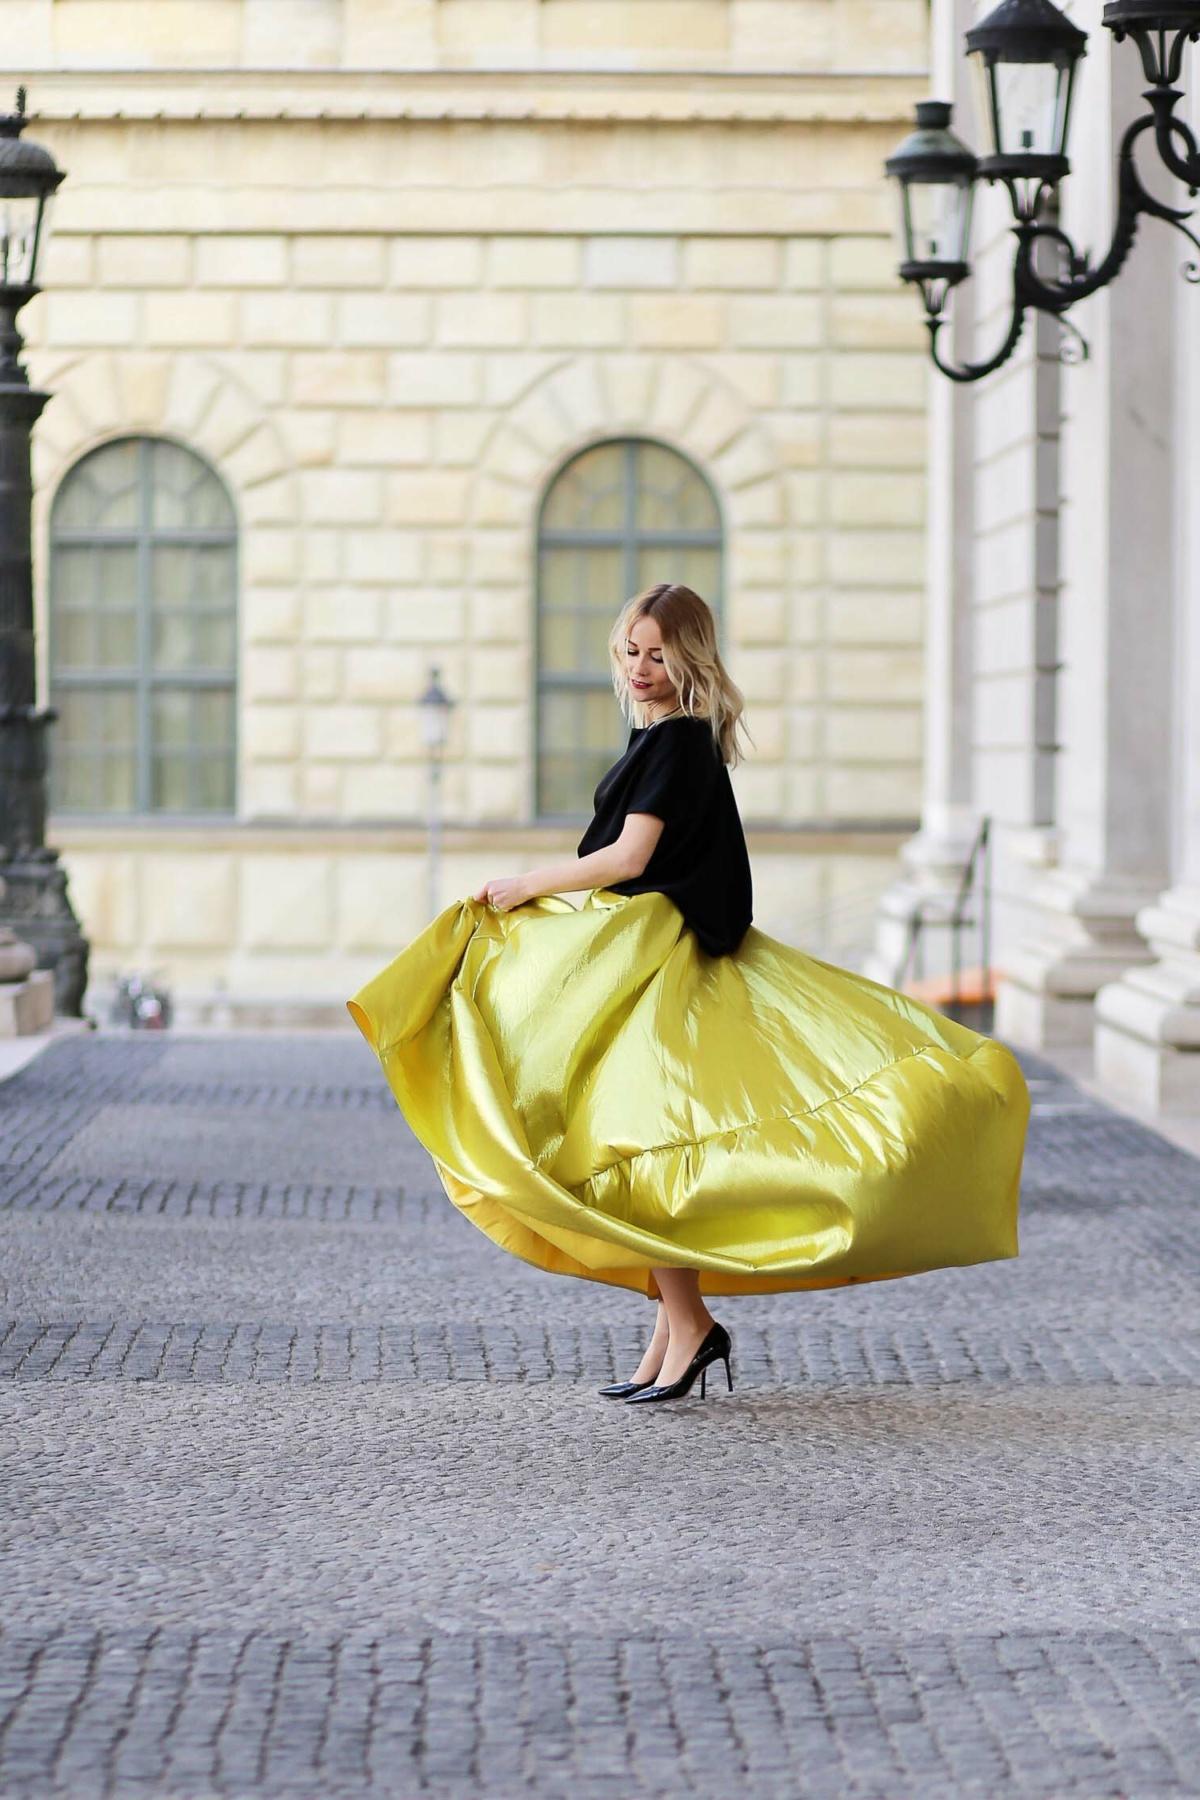 stylingliebe-fashionblog-muenchen-styleblog-munich-blogger-deutschland-fashionblogger-bloggerdeutschland-lifestyleblog-modeblog-germanblogger-bambi-verleihung-2016-10